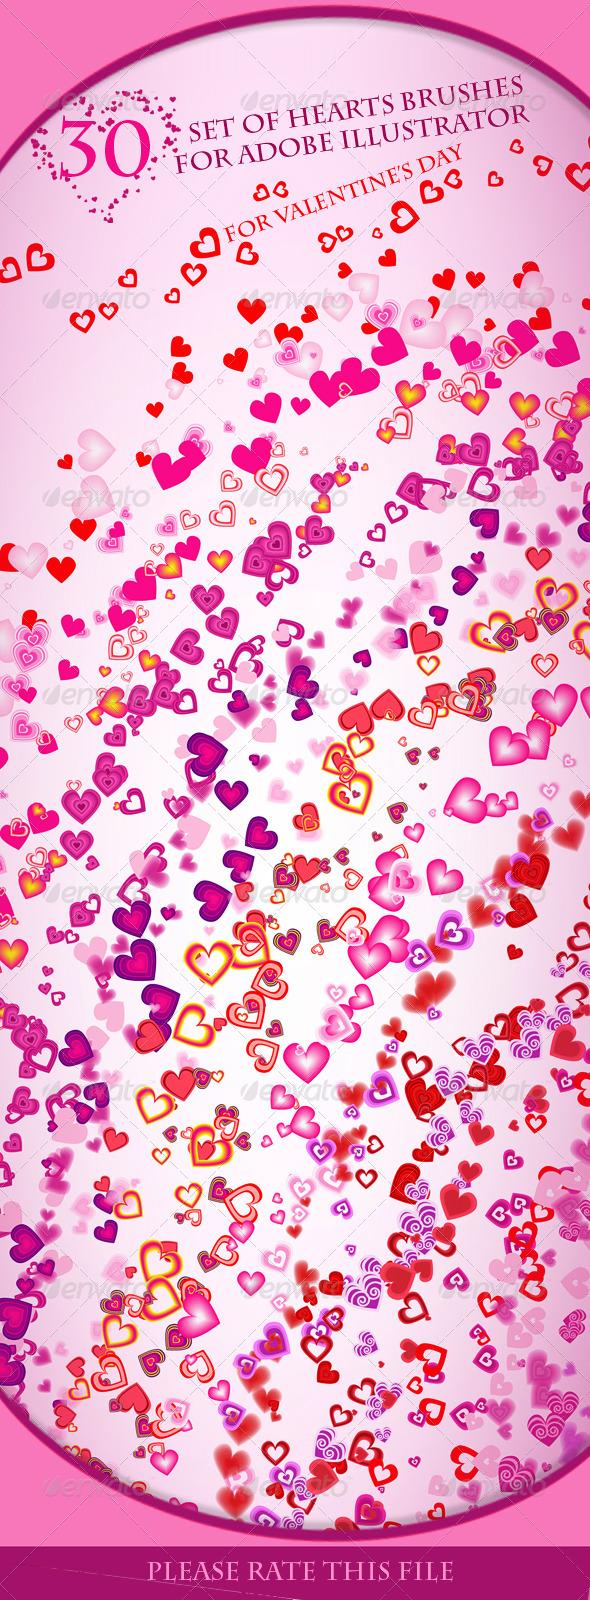 GraphicRiver Set of Hearts Brushes for Adobe Illustrator 6573438